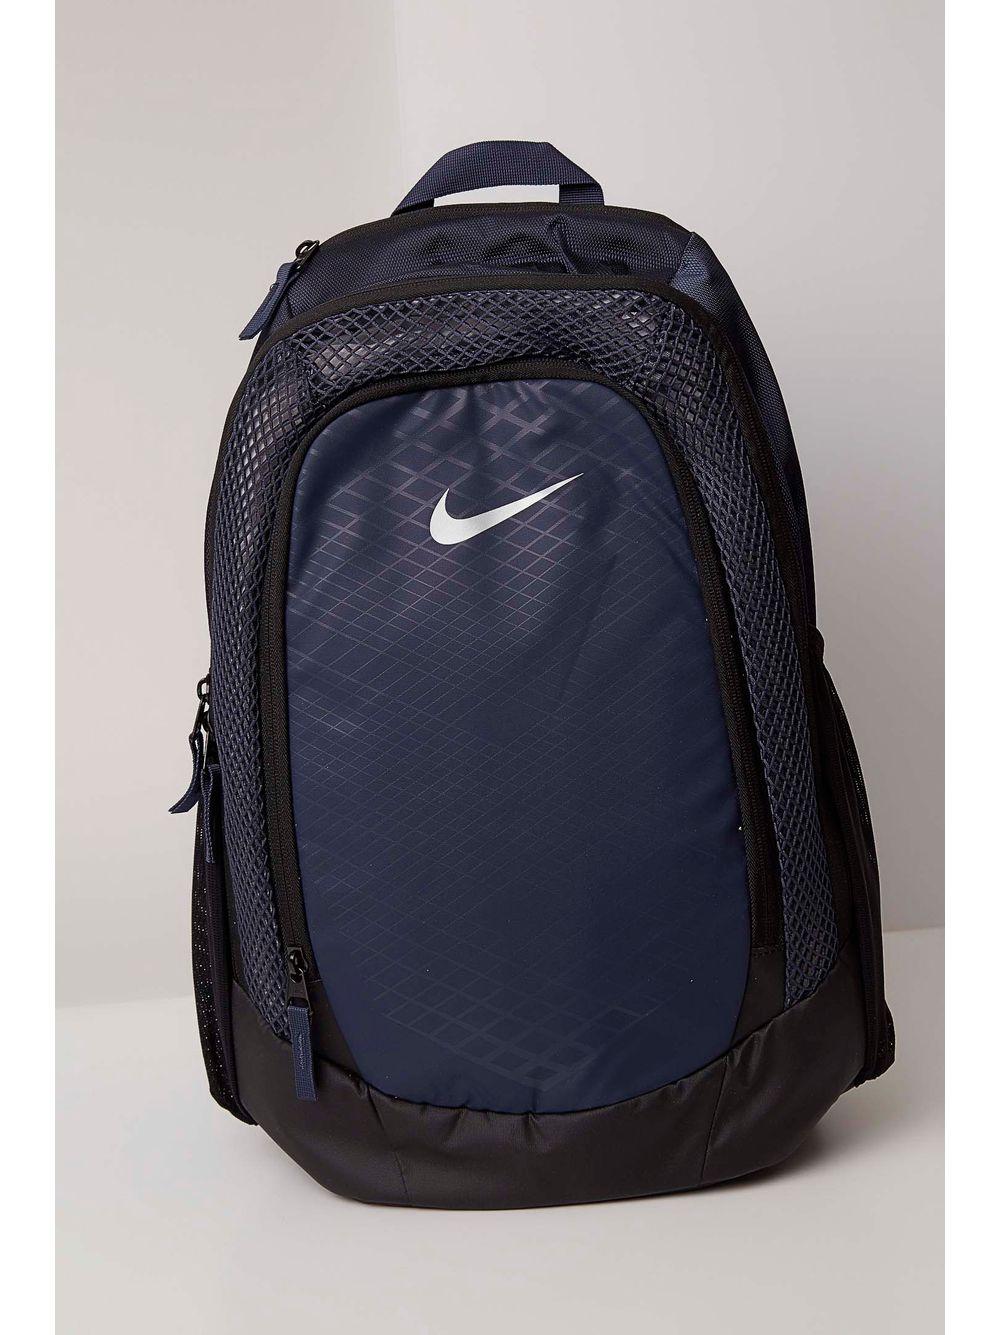 Mochila Esportiva Nike. Azul - pittol 419969c4212d5